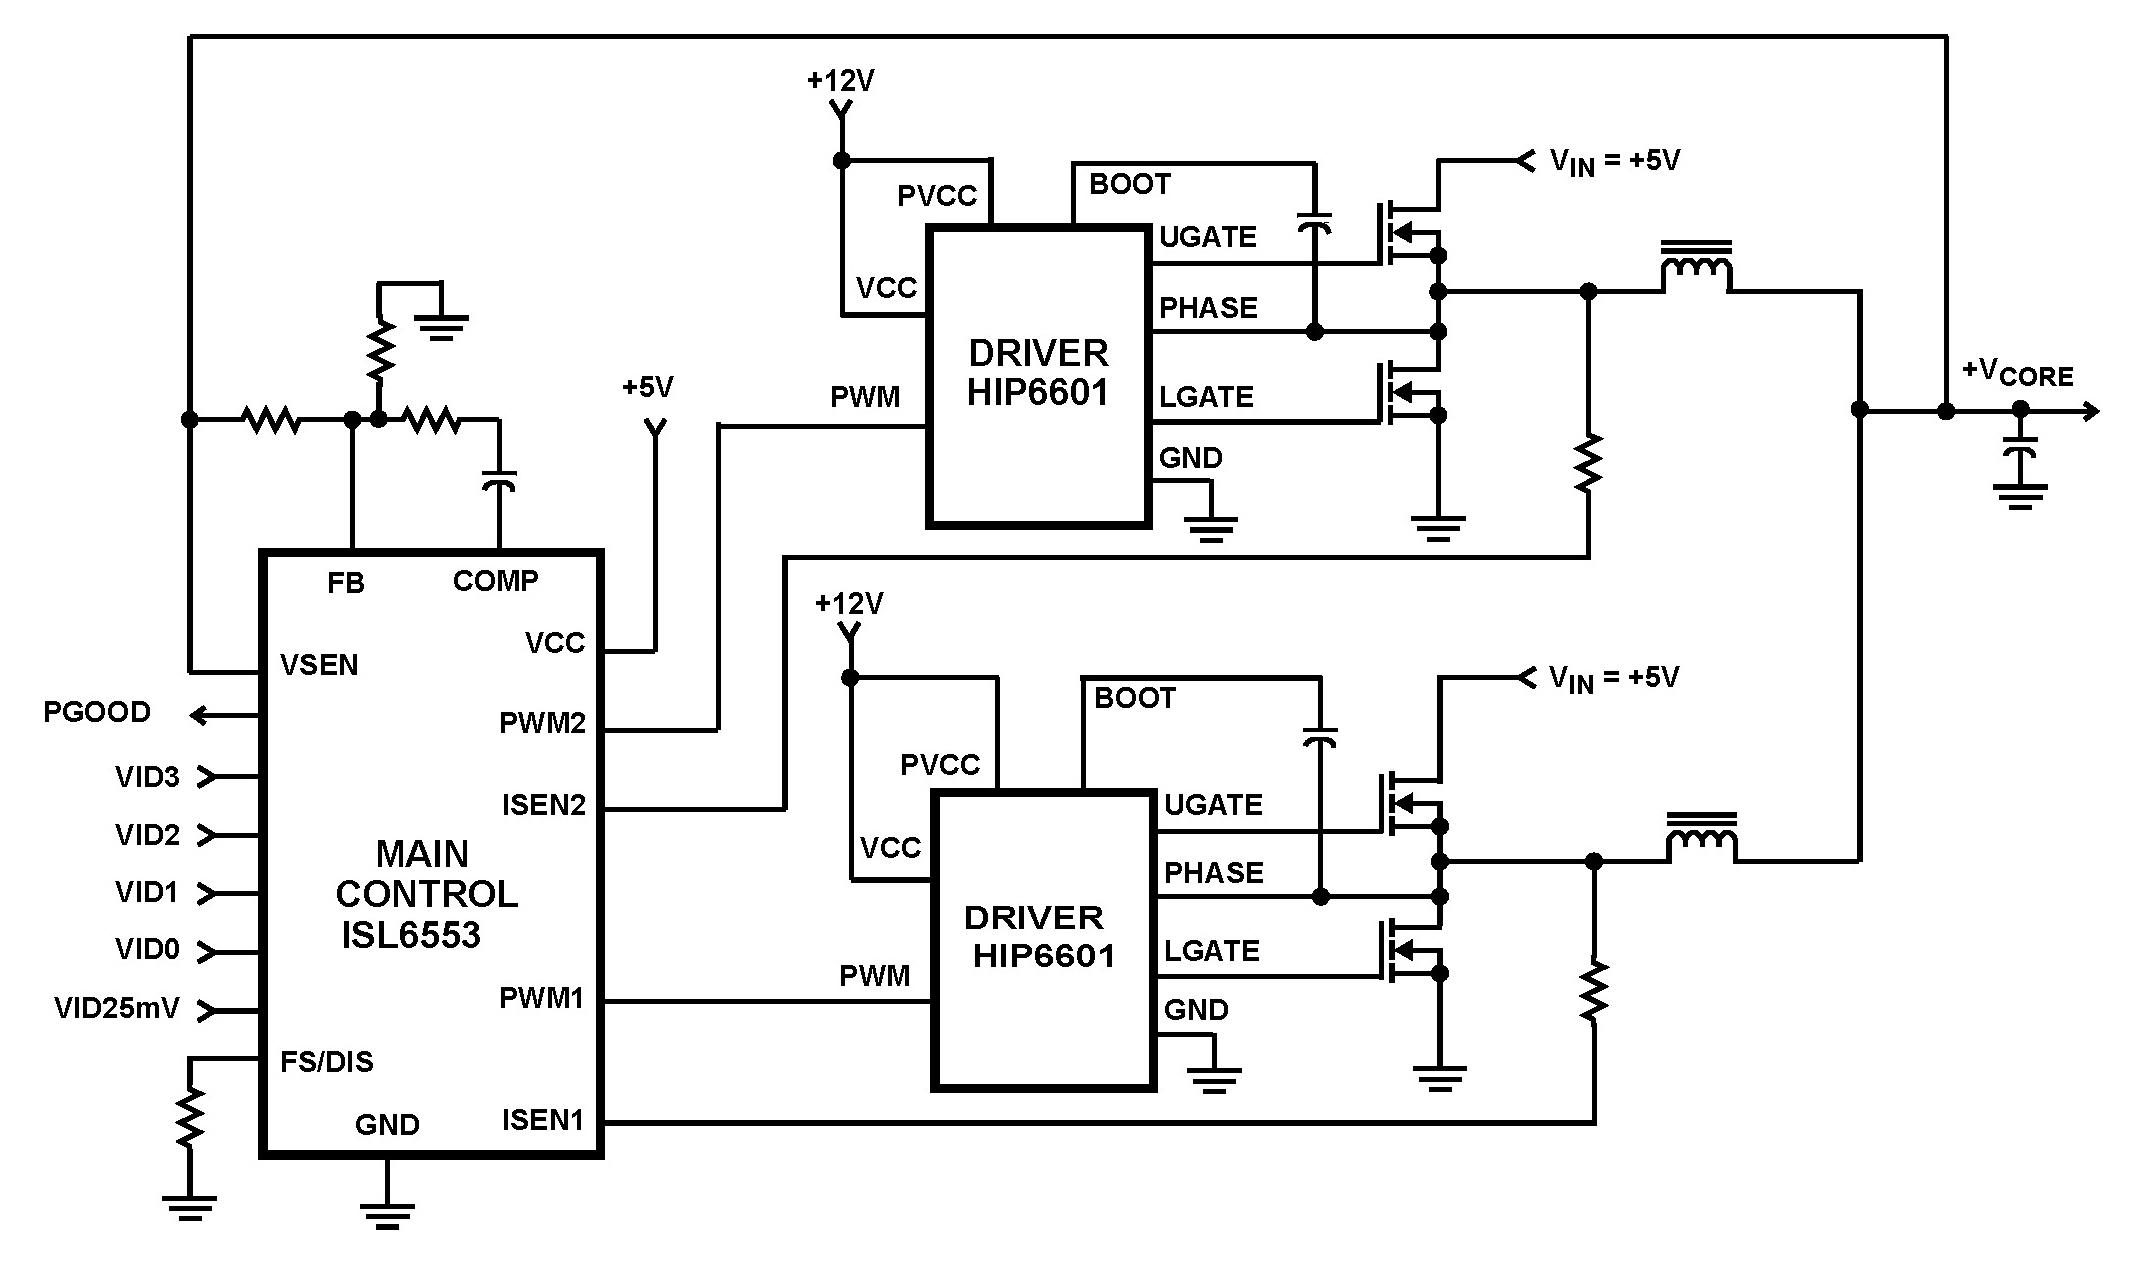 Gt Circuits Gt Isl Microprocessor Core Voltage Regulator 2 Phase Buck Pwm Controller L